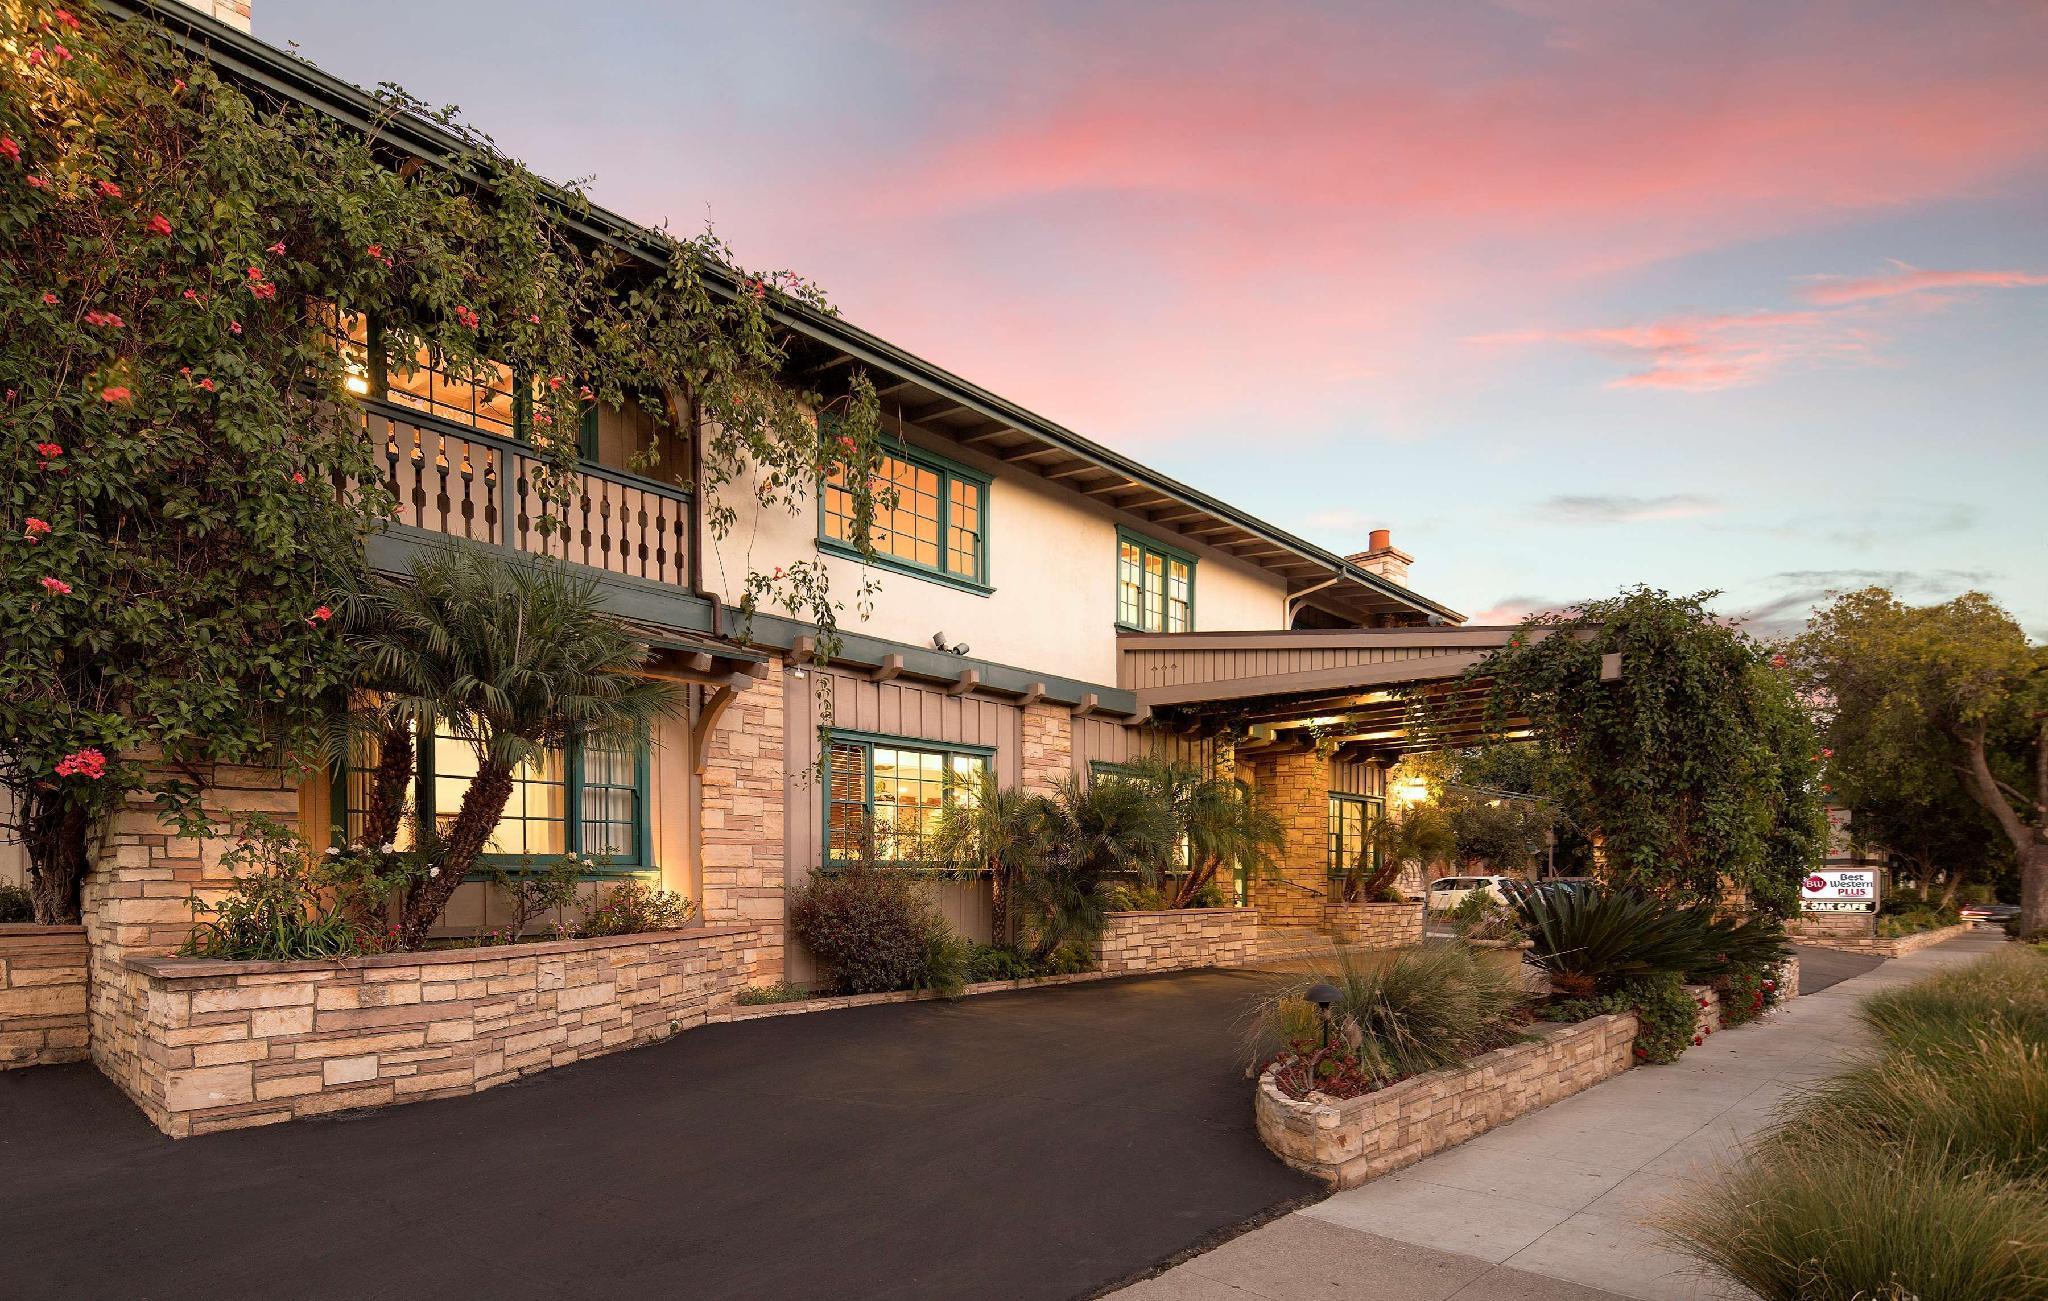 Best Western Plus Encina Lodge and Suites image